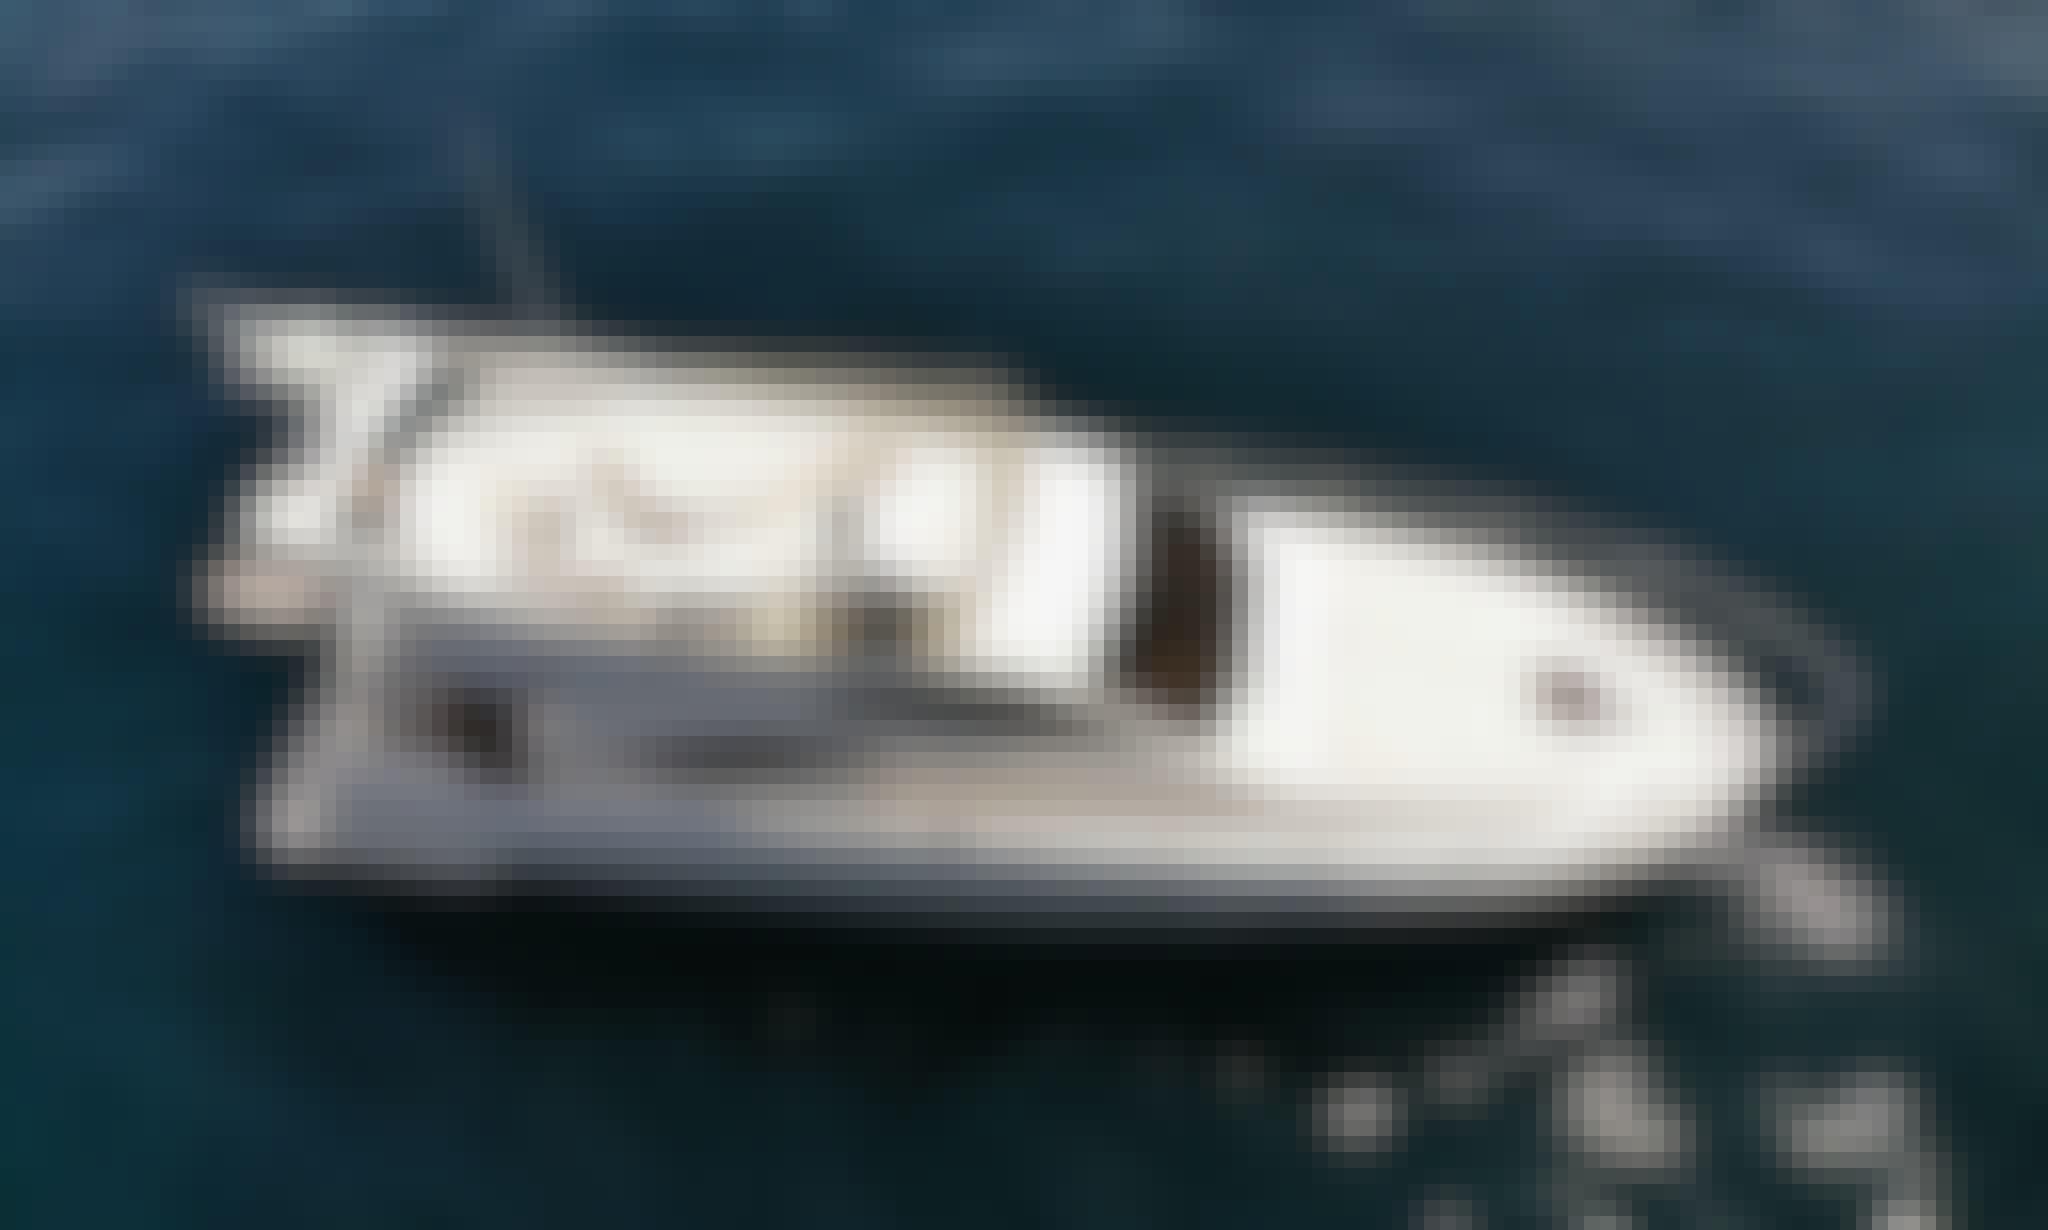 11 Person Ferretti 430 Motor Yacht Charter in Marbella, Andalucía